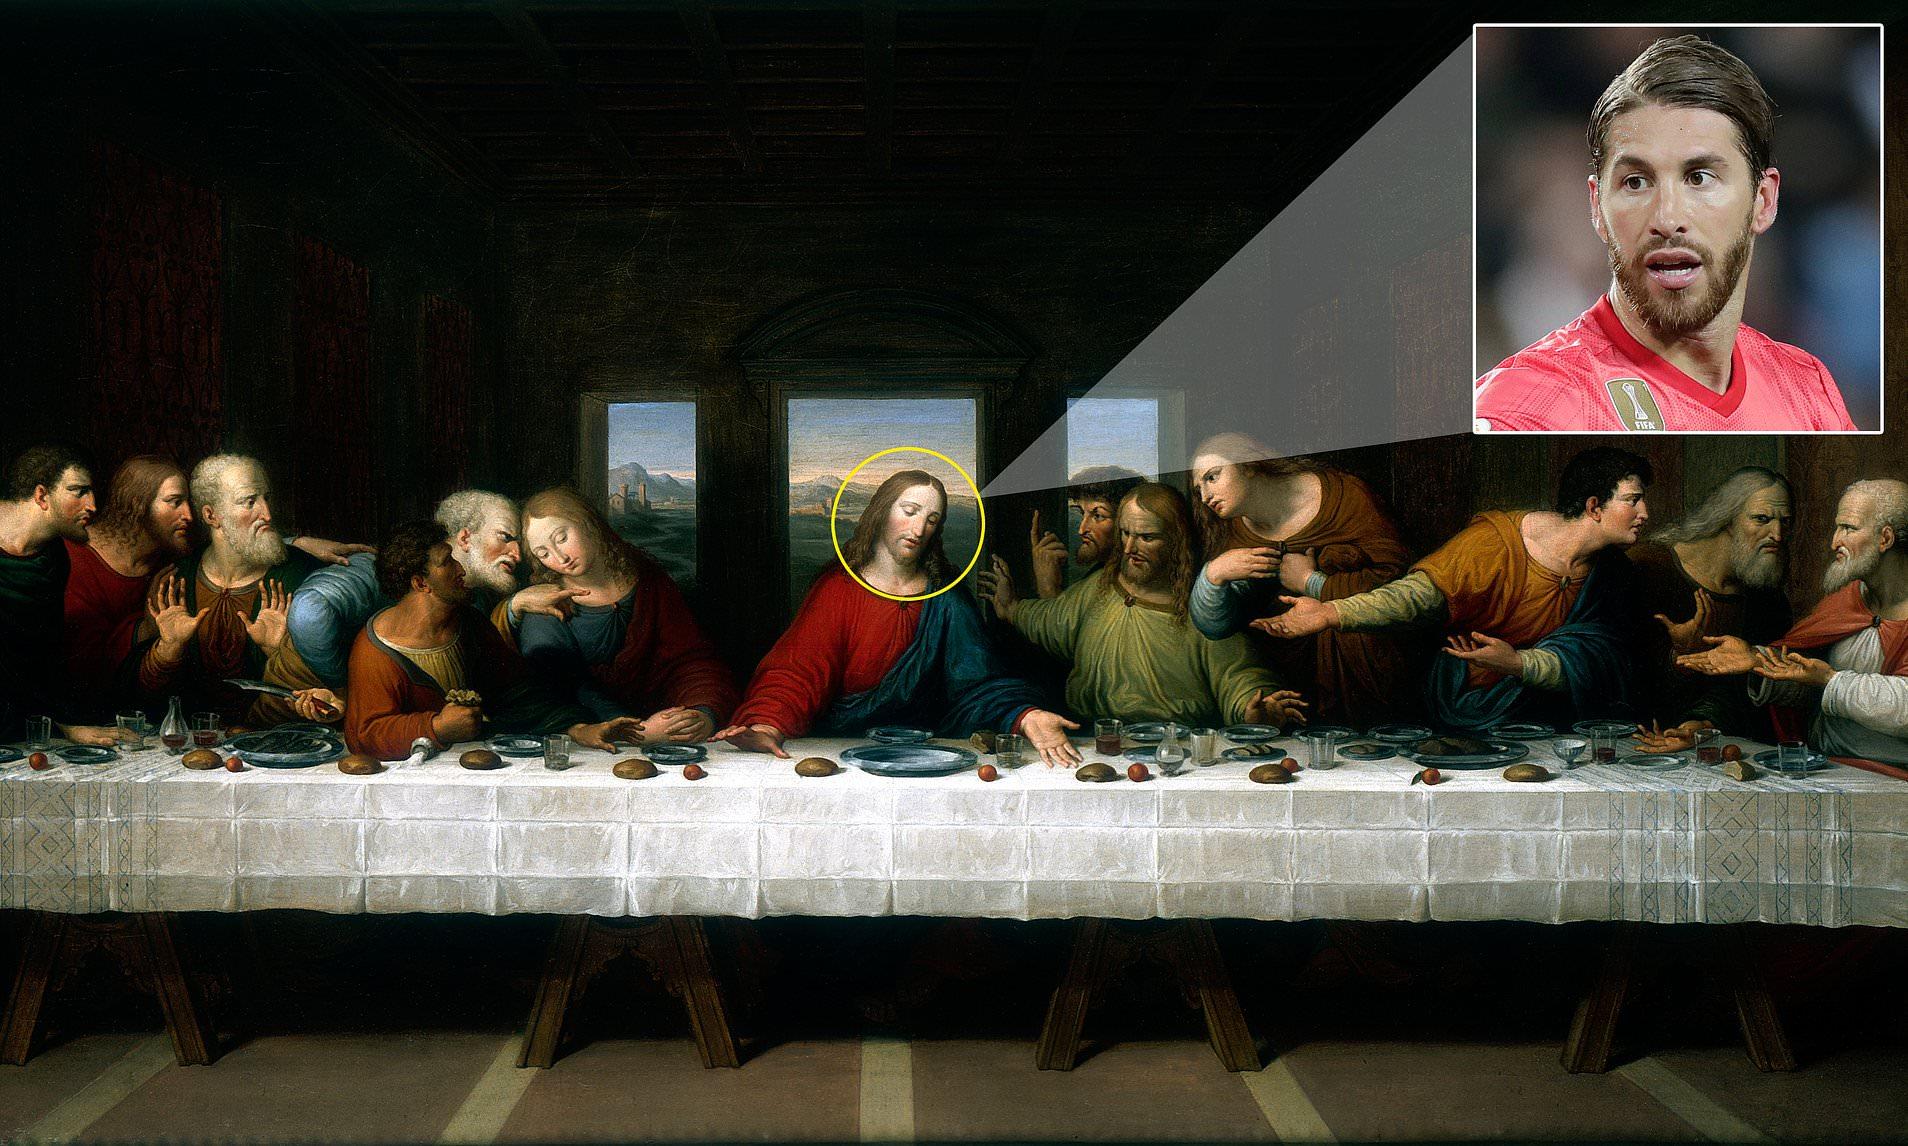 Sergio Ramos Meme – Gone too far?